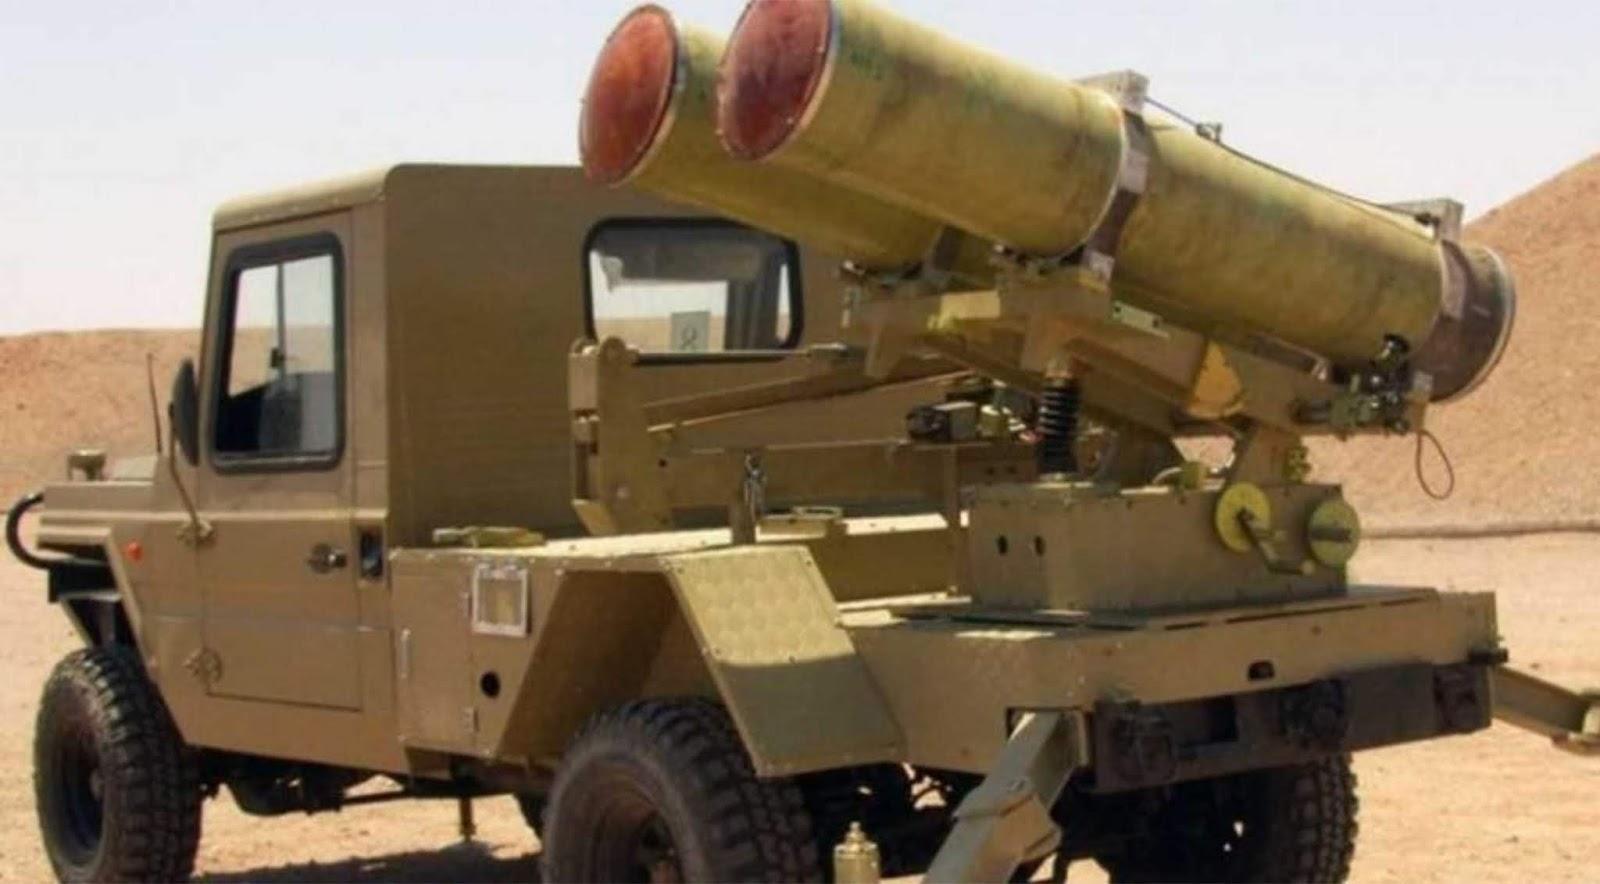 Sumber-sumber Israel mengakui Hamas memiliki roket yang mengubah permainan